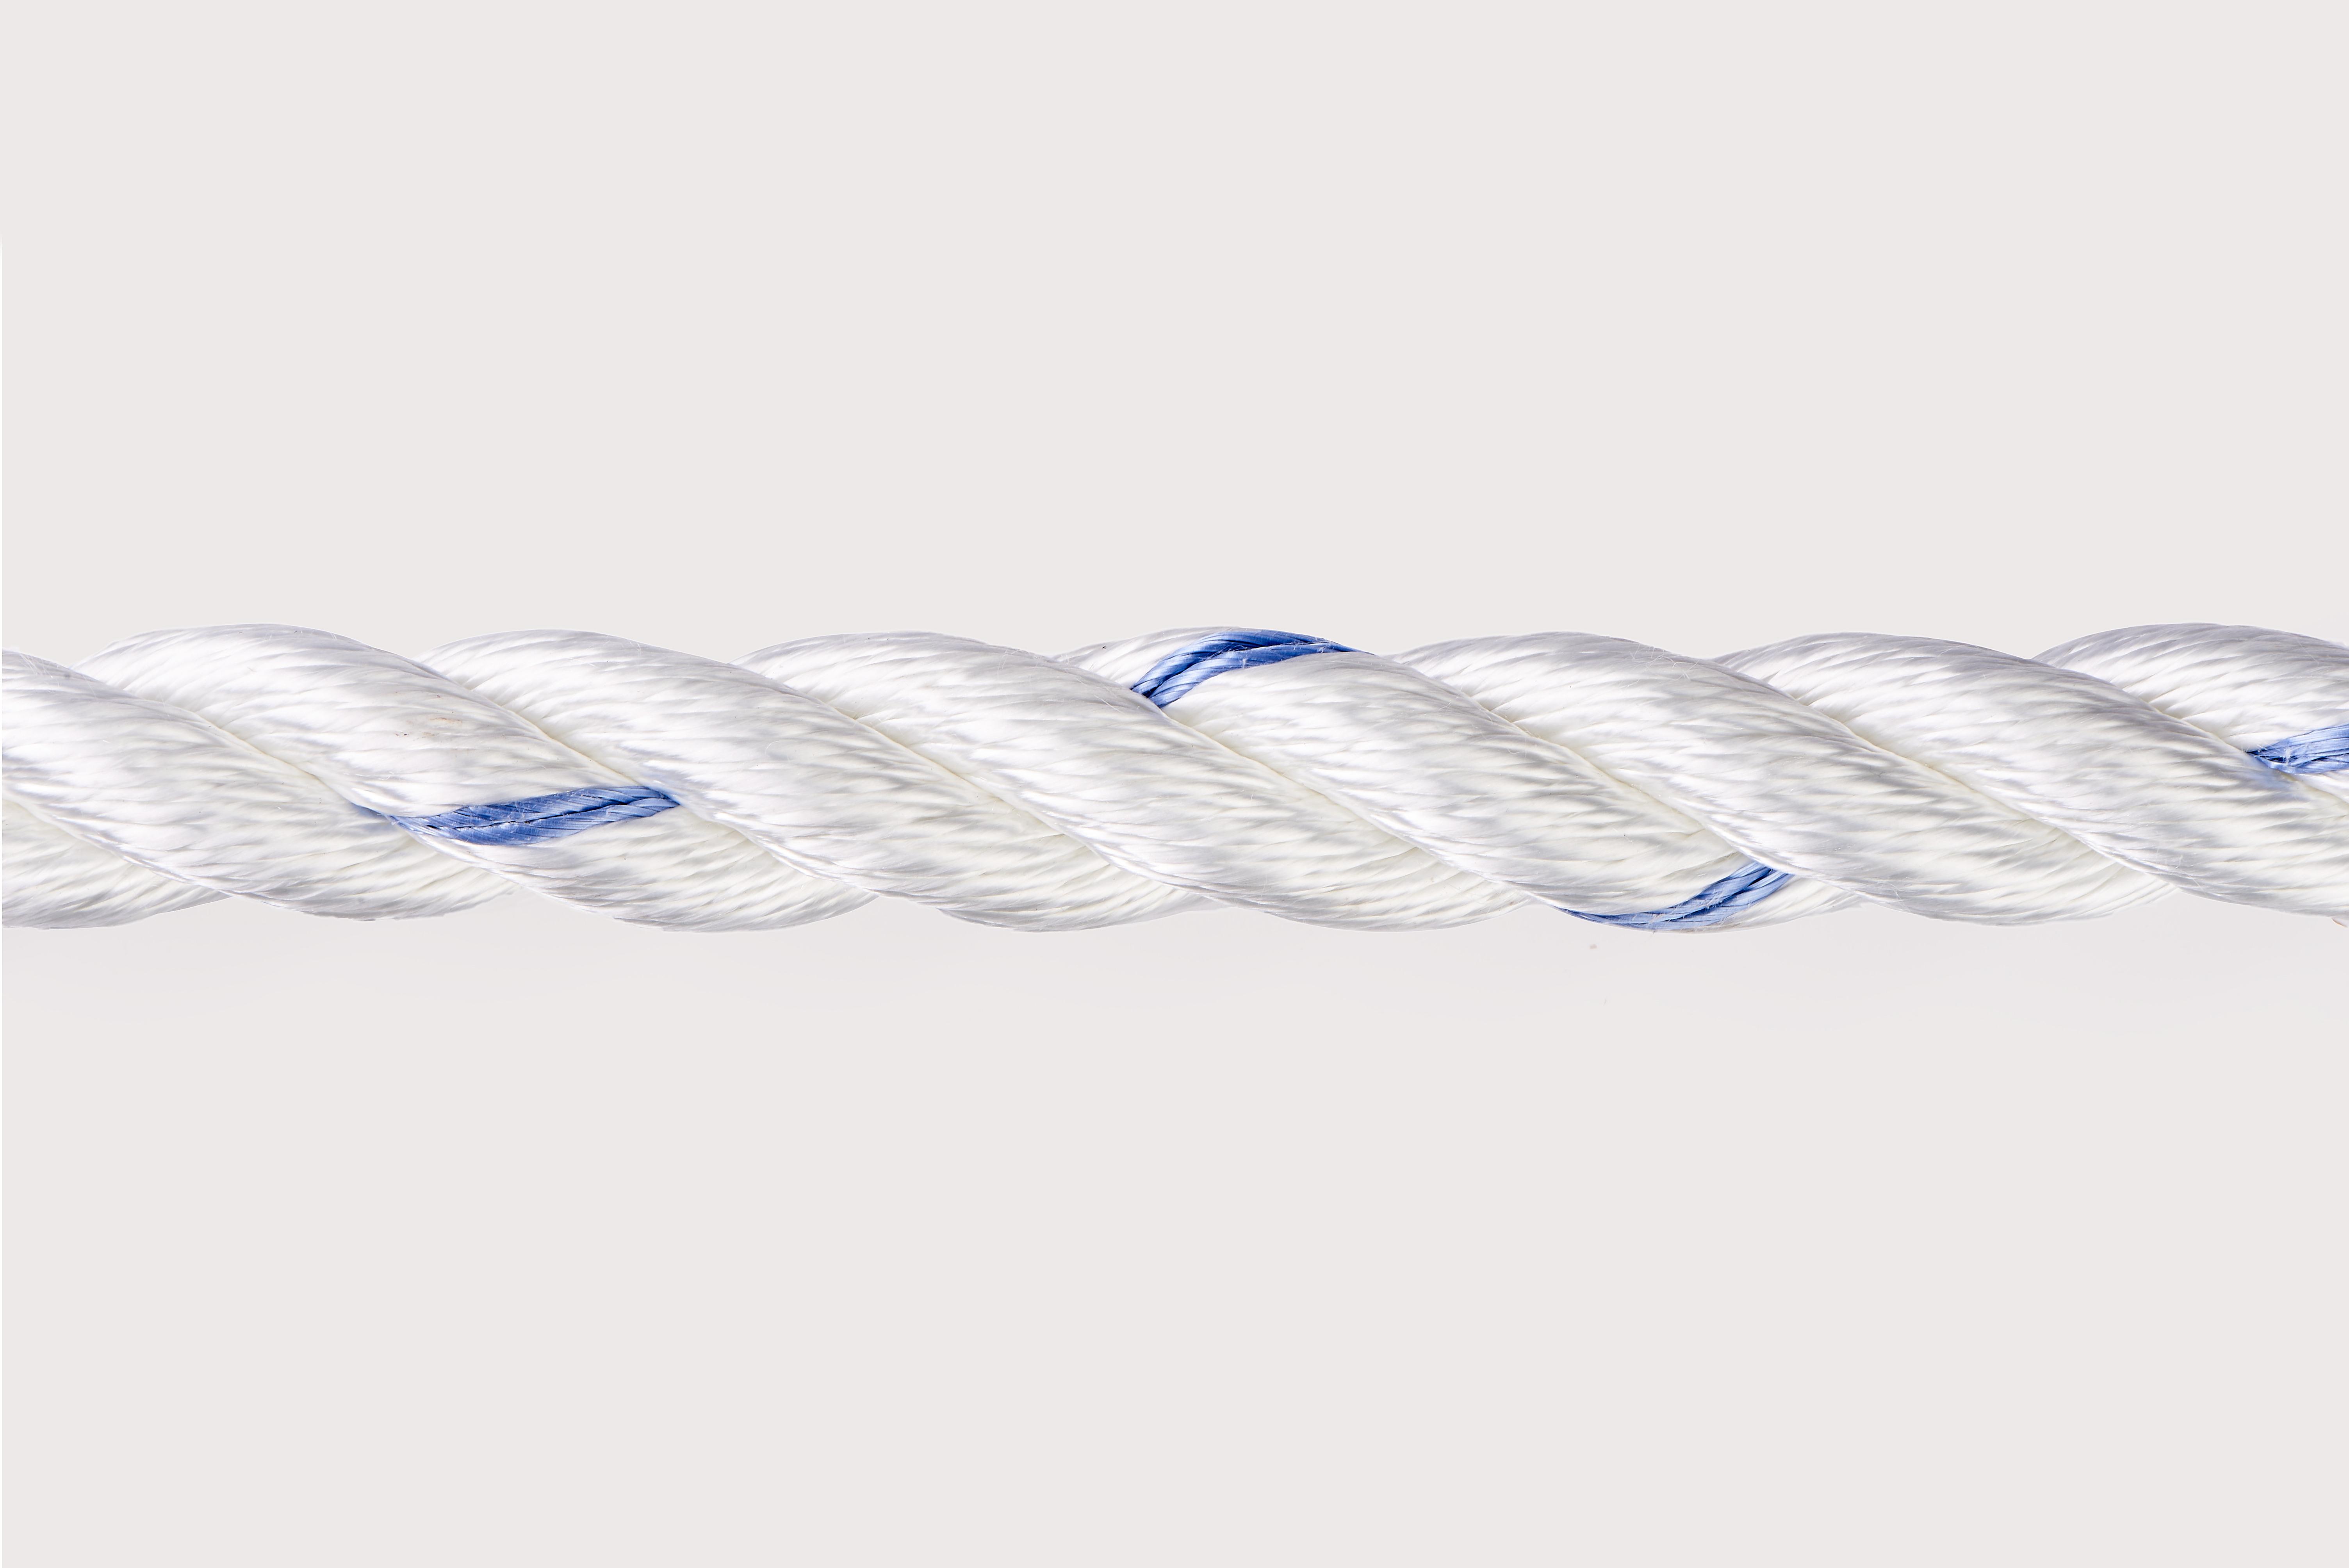 Orion-Cordage-Prodac 3-Strand Combination-White I Blue-Horizontal161.jpg